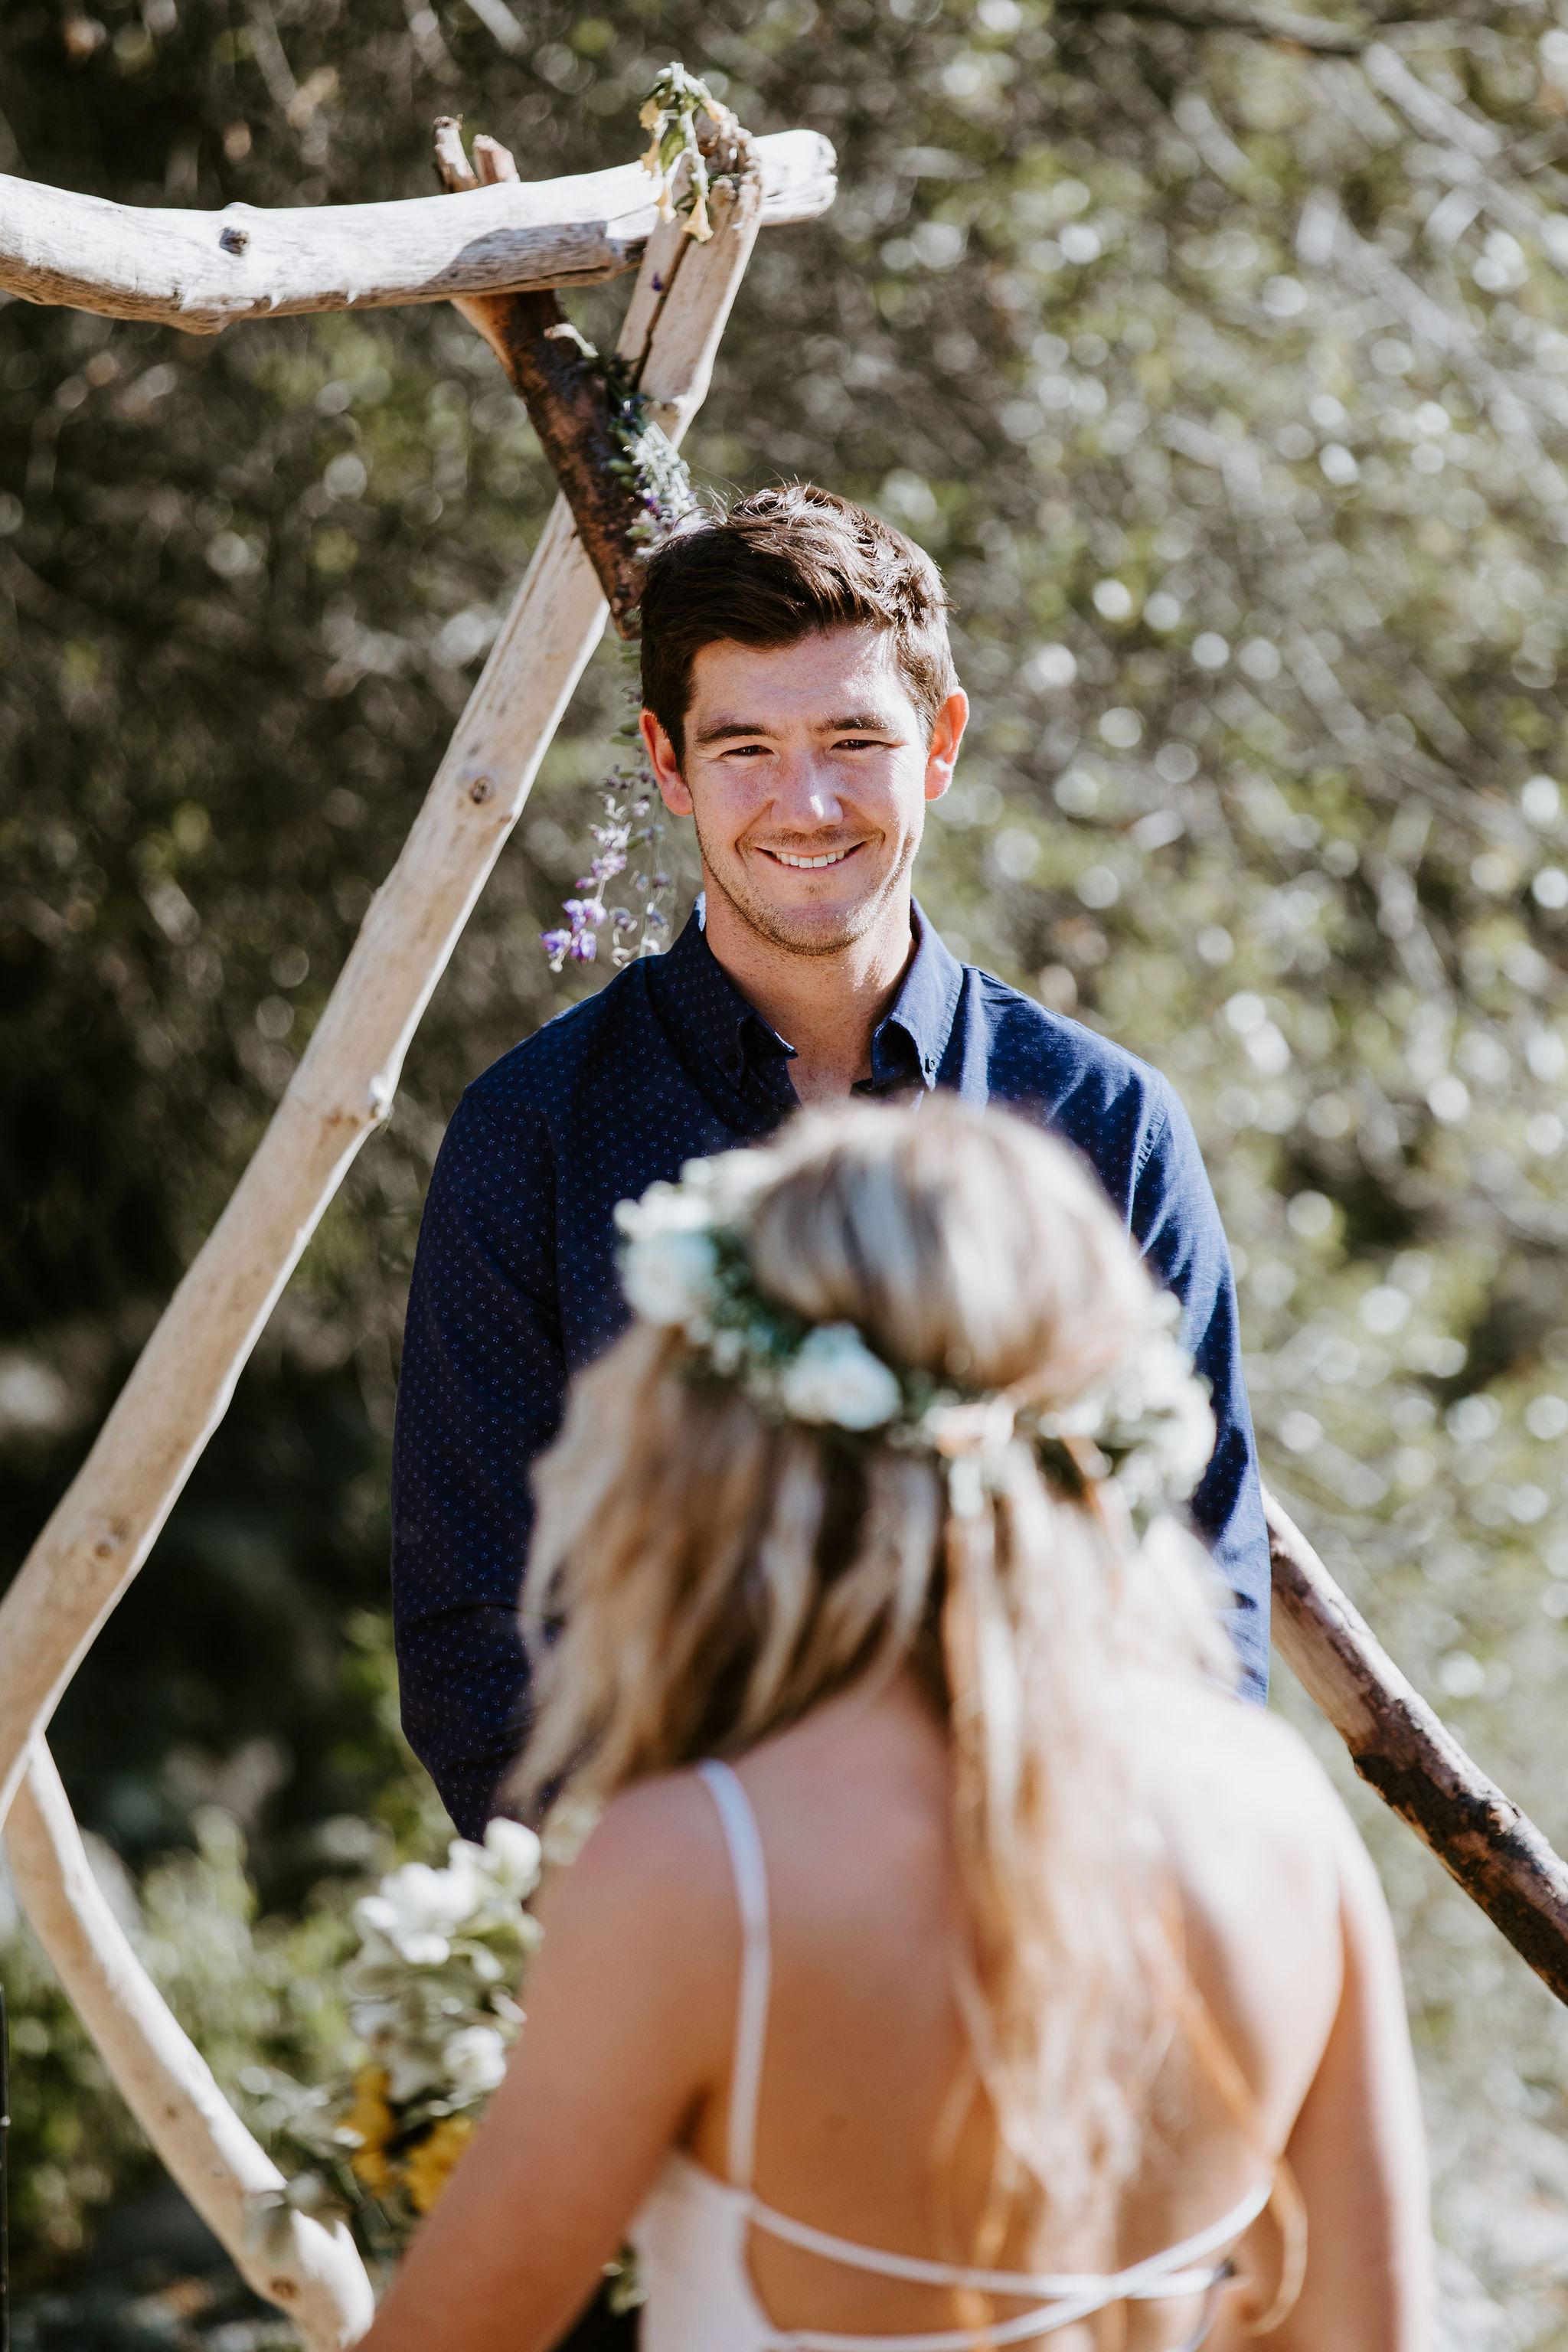 RedwoodRanch_Geoff&LyndsiPhotography_Mike&Amanda_Ceremony50.jpg